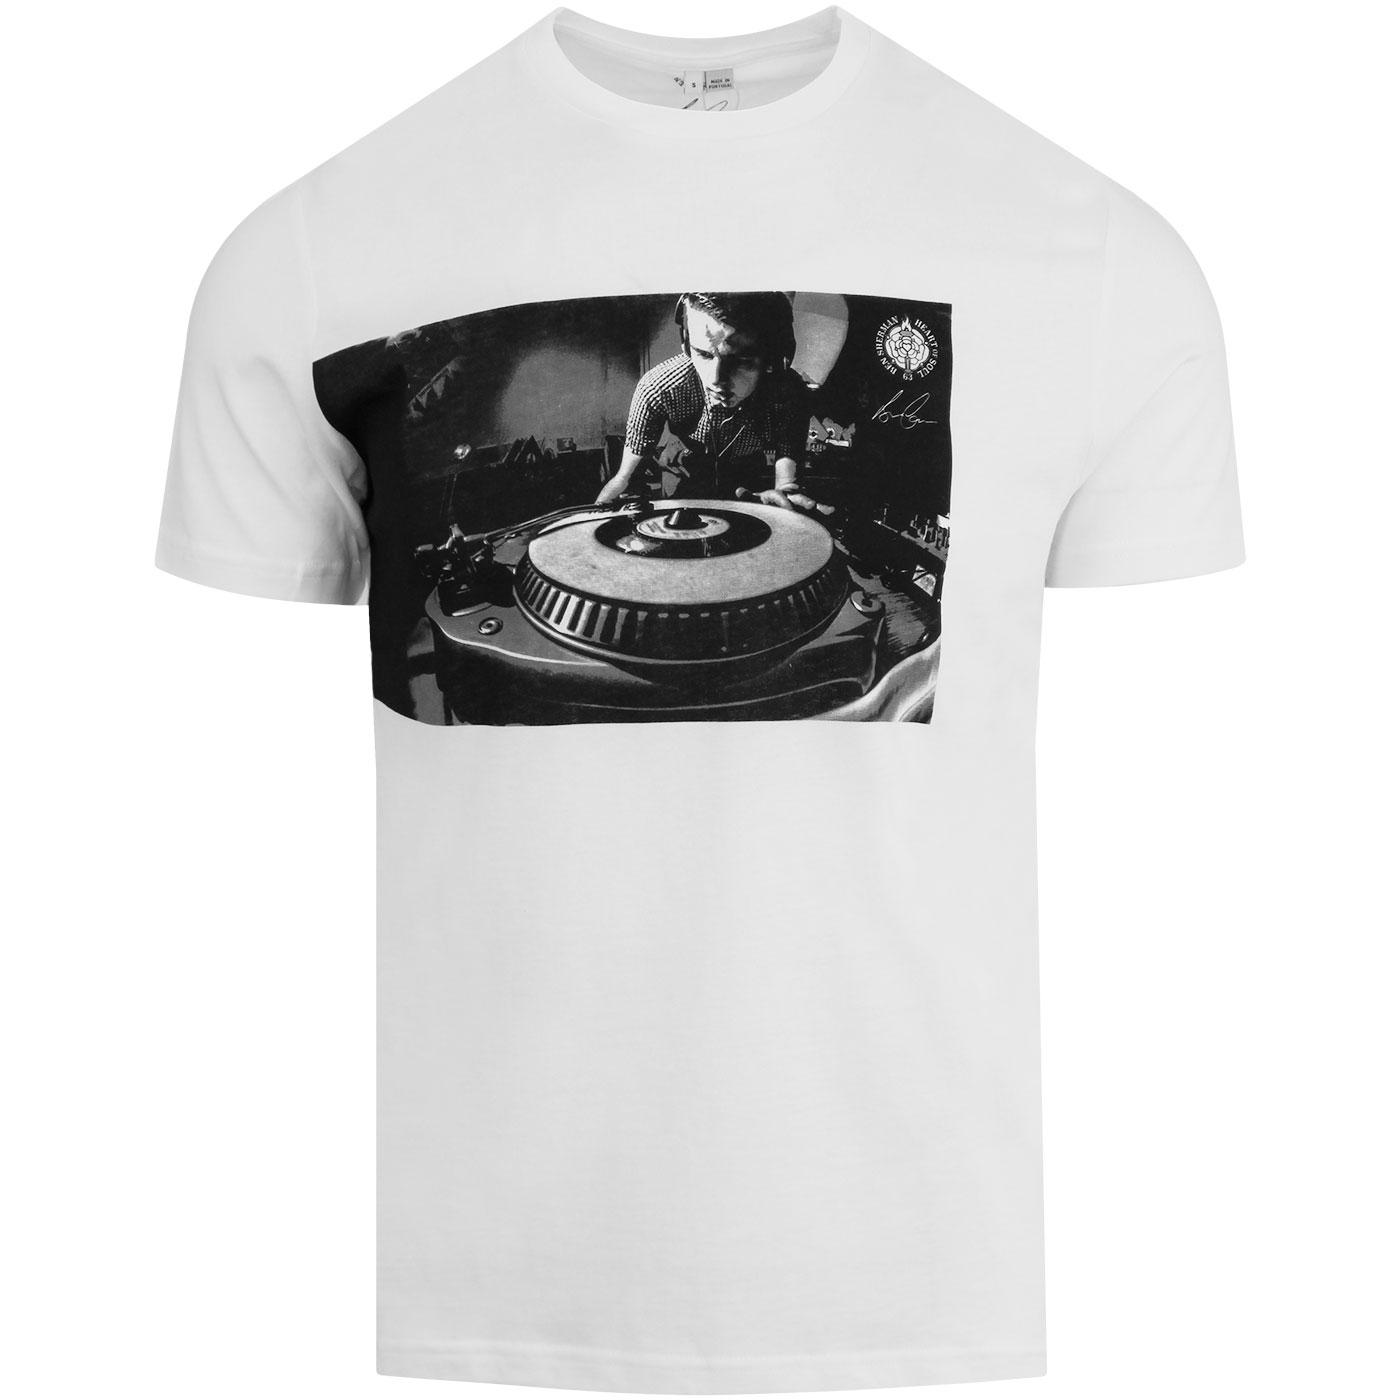 BEN SHERMAN Retro Brian Cannon DJ Photo T-Shirt